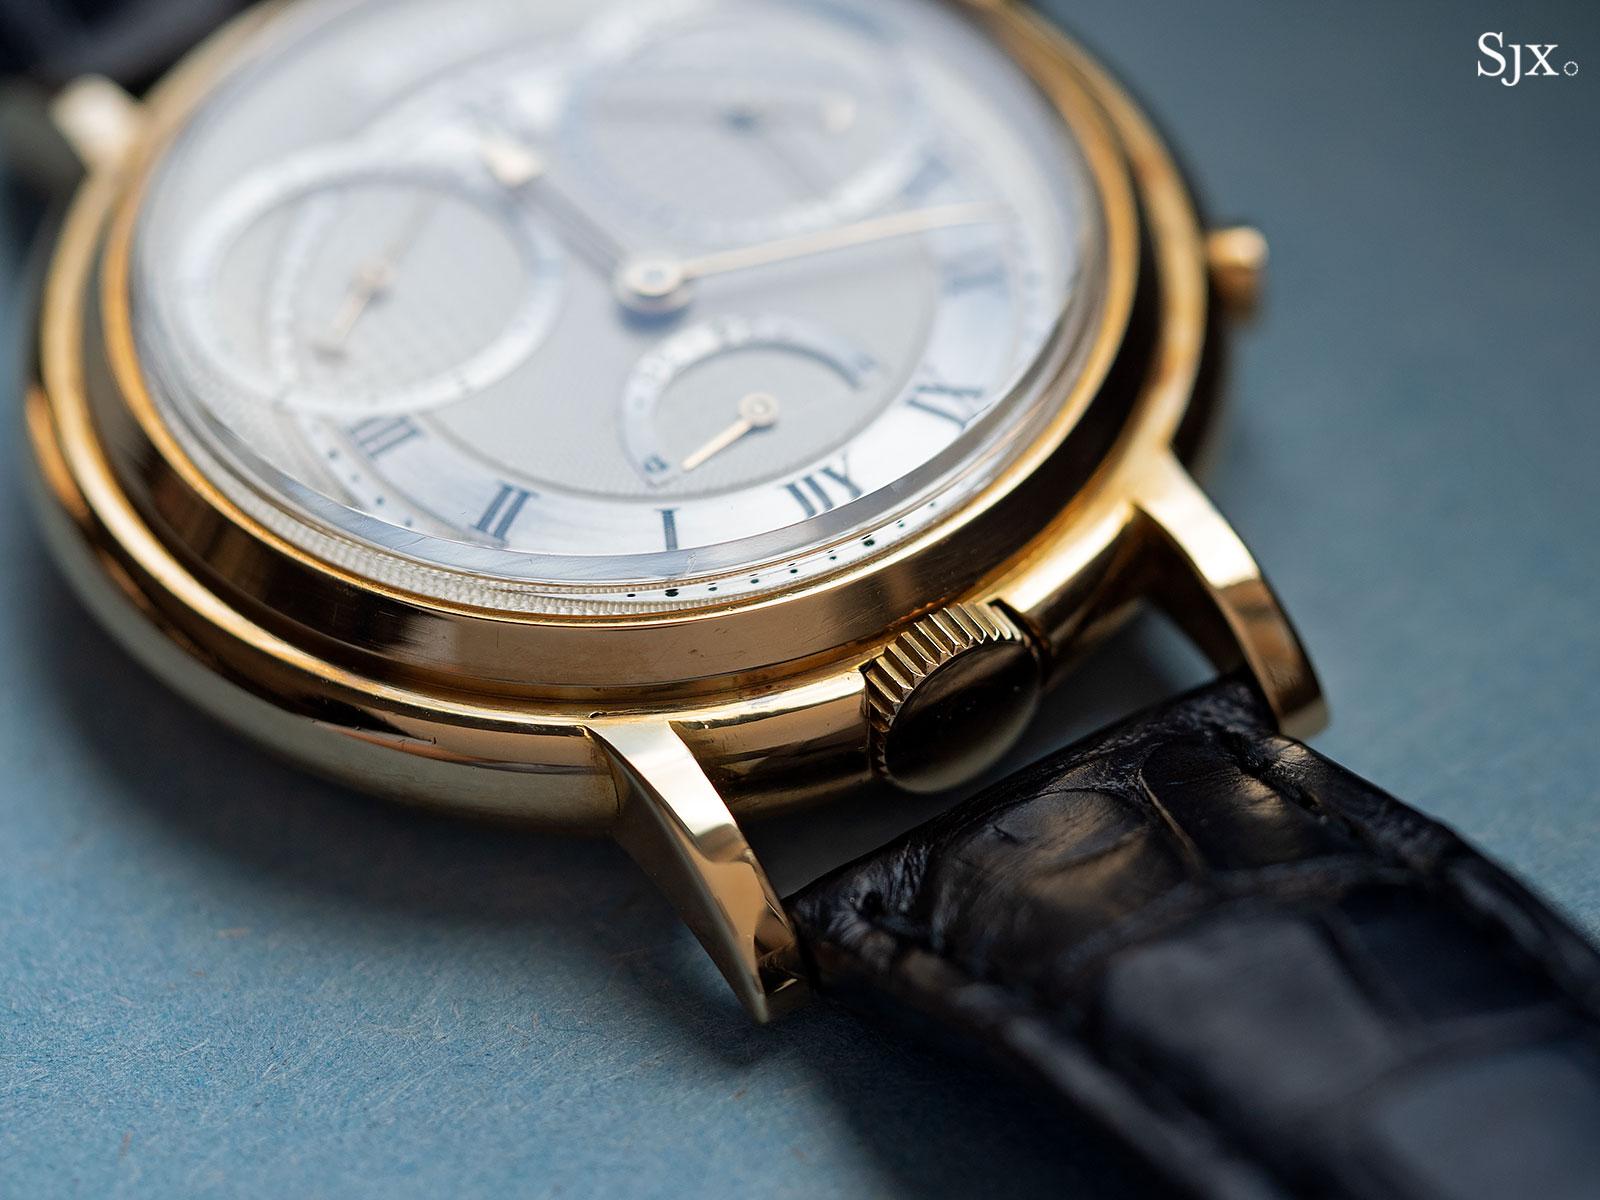 George Daniels Chronograph Wristwatch with tourbillon 11